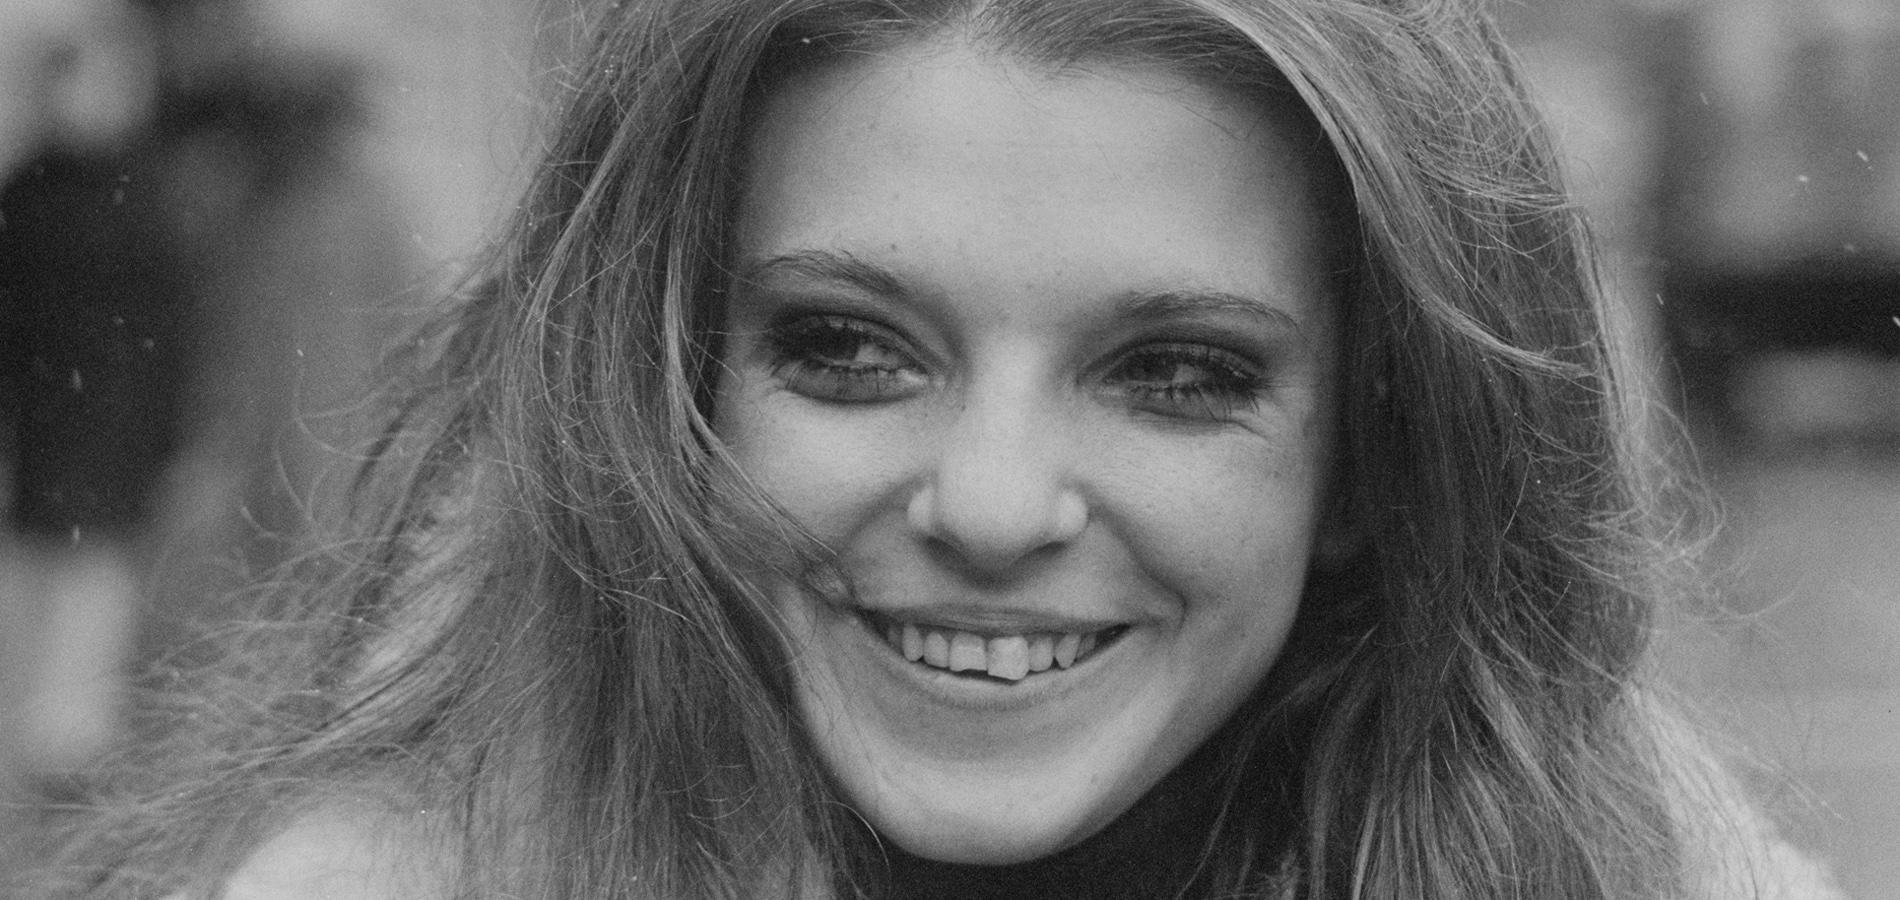 Mary Austin Le Grand Amour De Freddie Mercury Madame Figaro